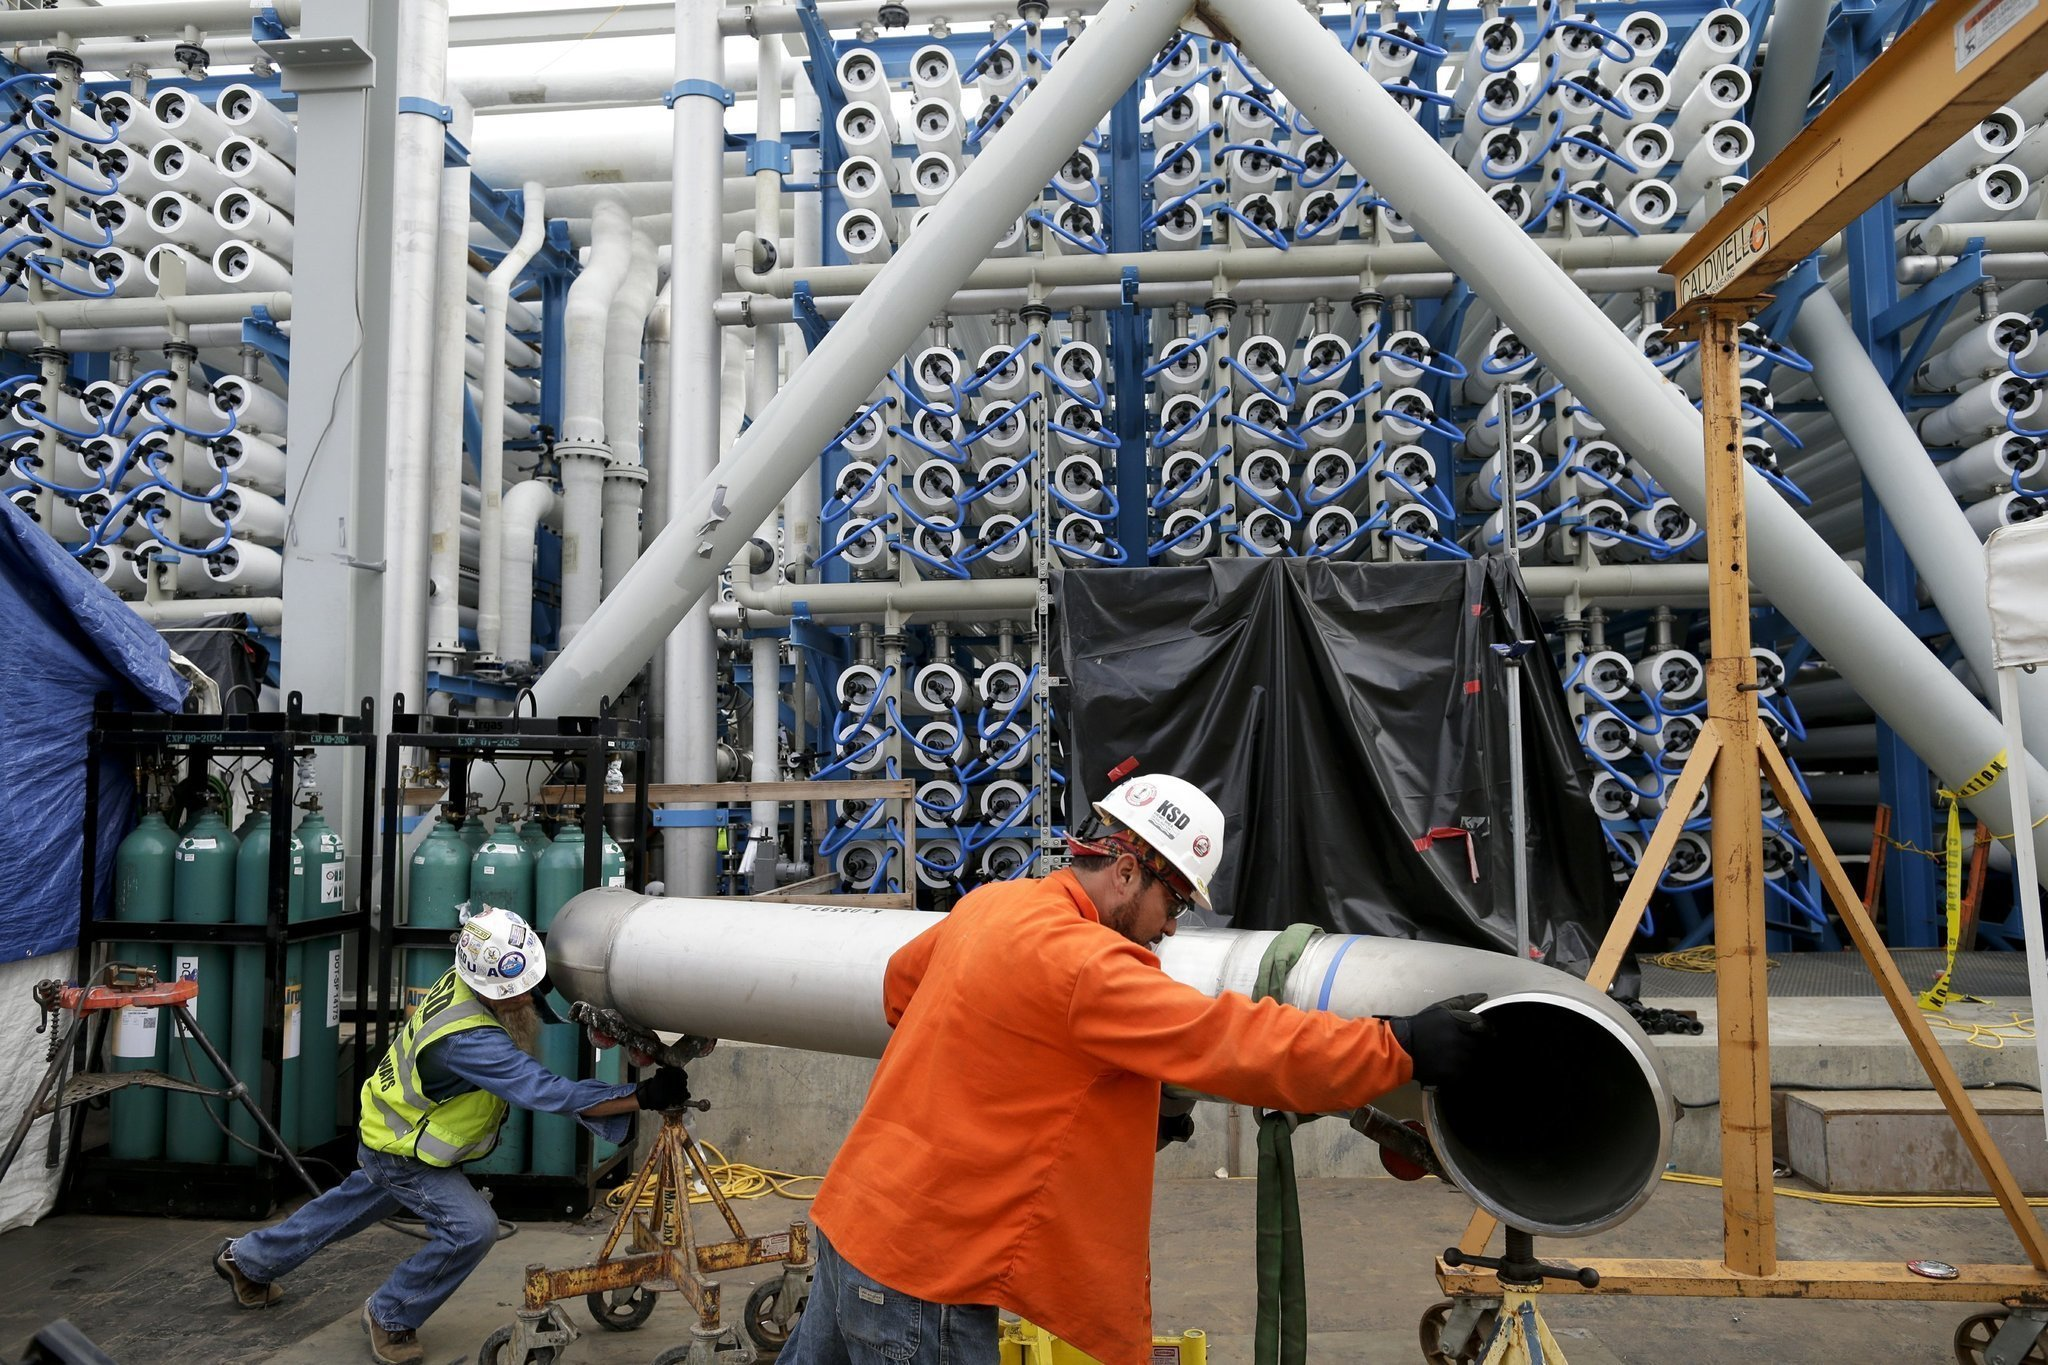 Poseidon desalination plant in Carlsbad nears opening The San